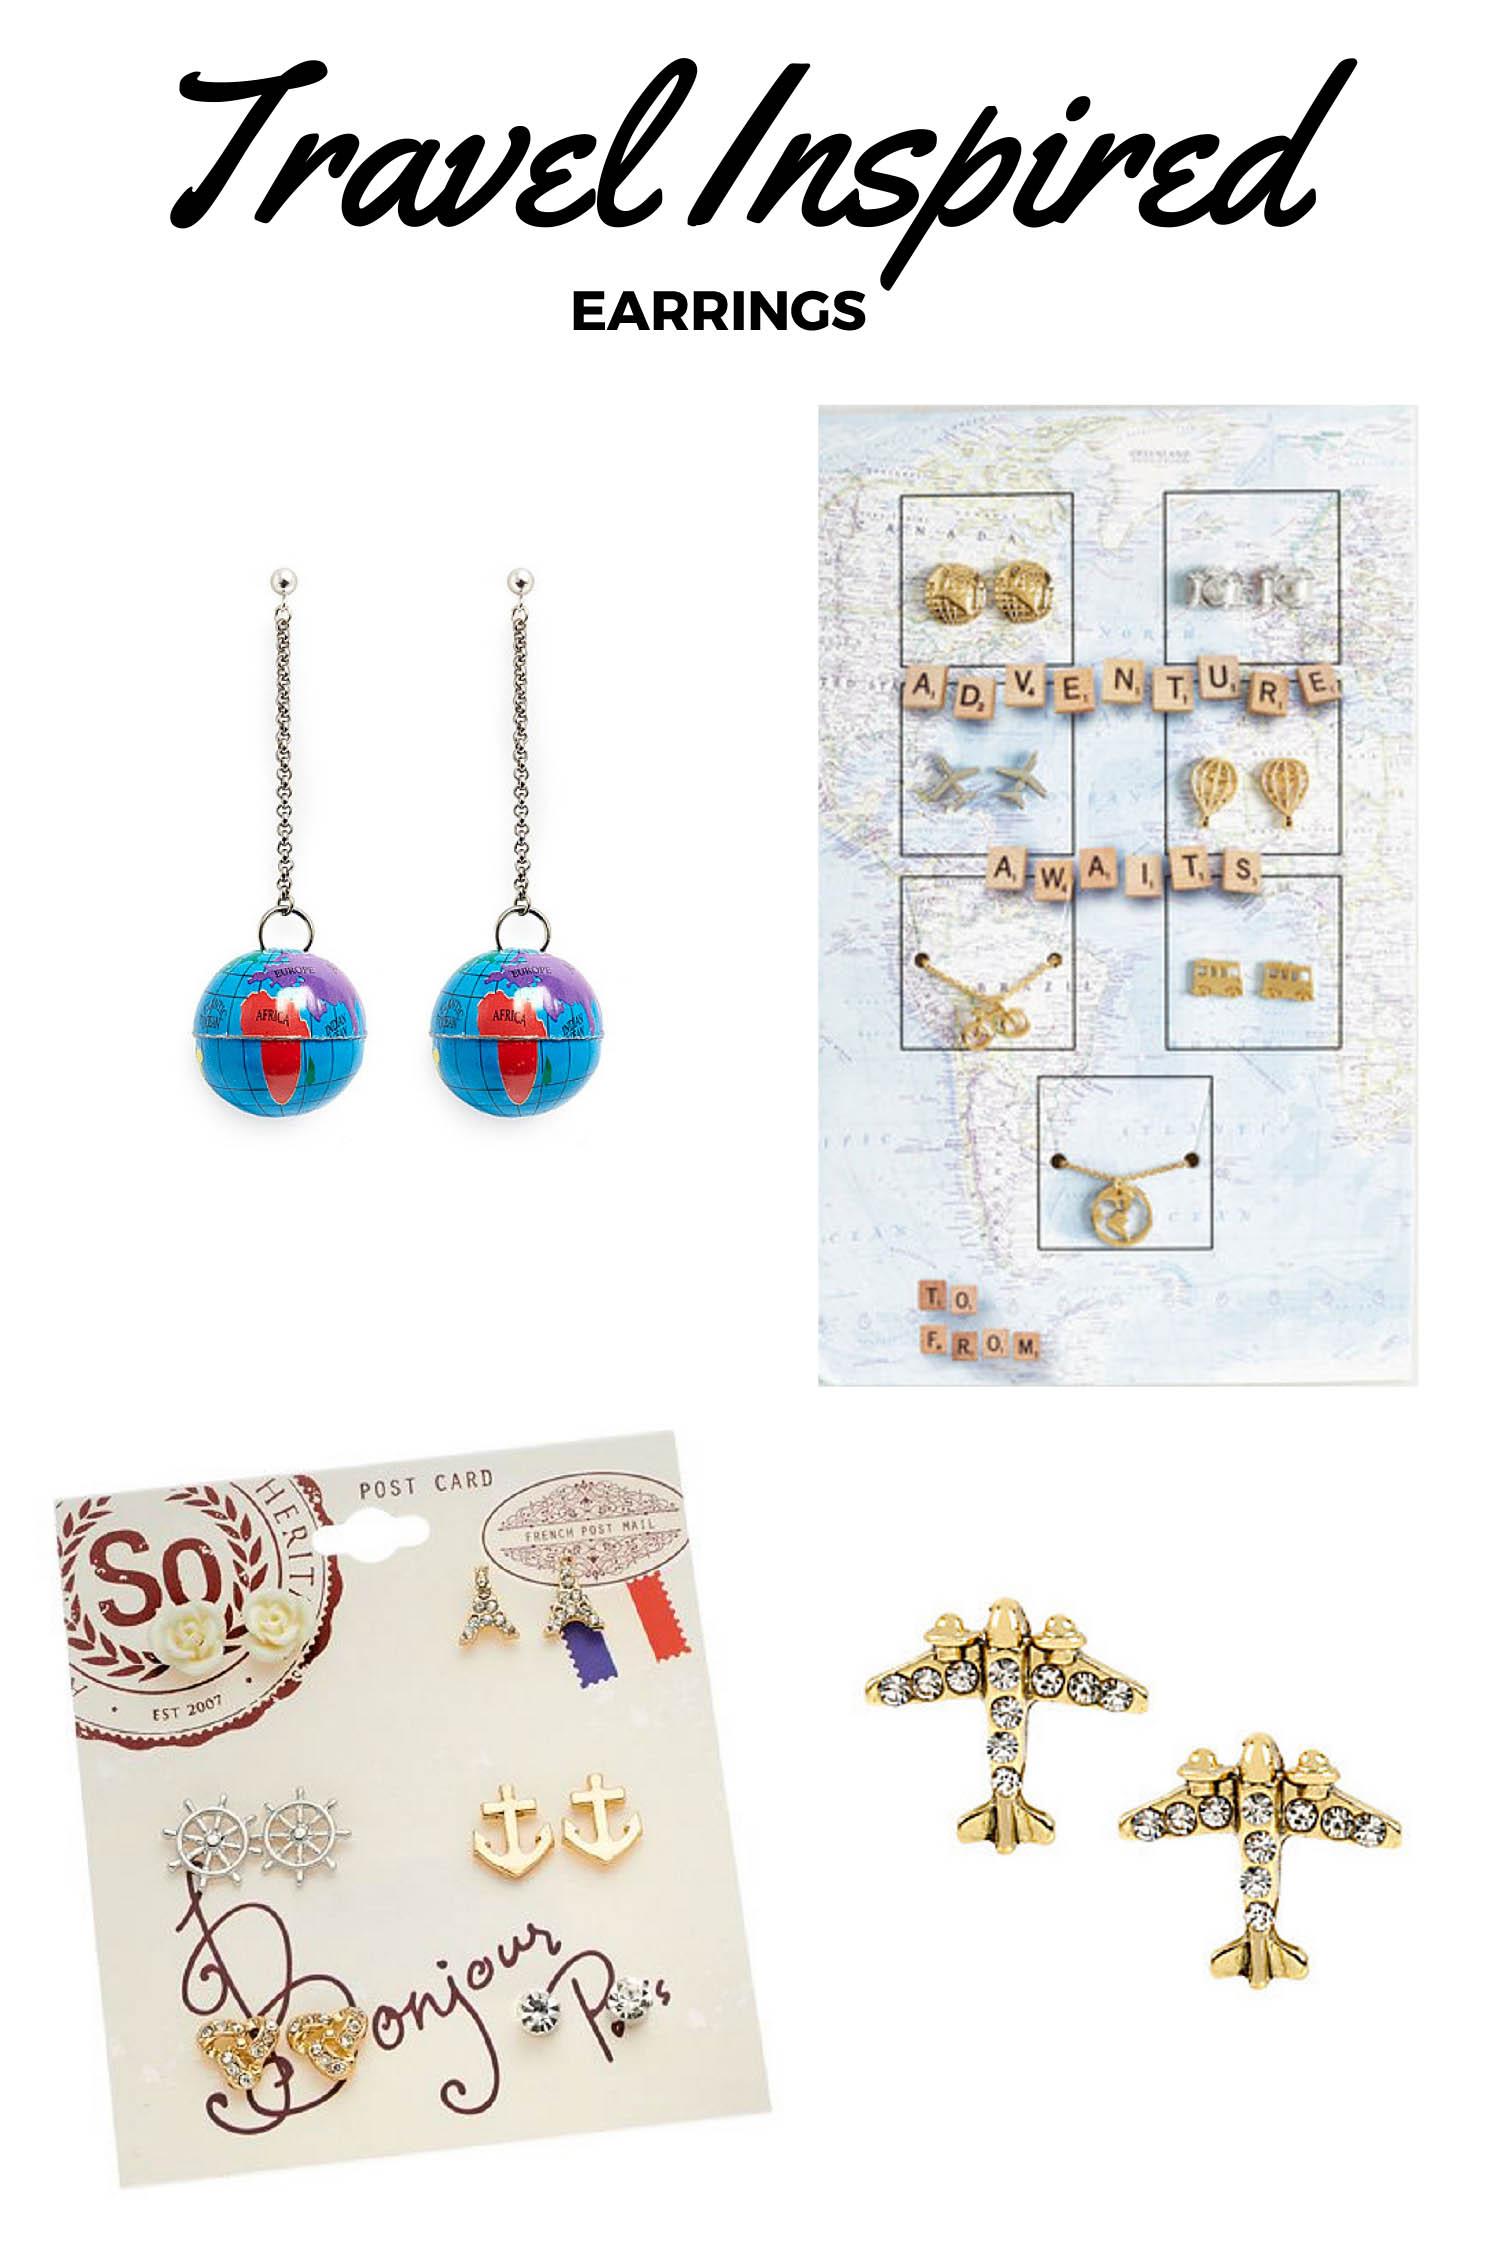 Travel-Inspired Earrings - Travel Inspired Jewelry